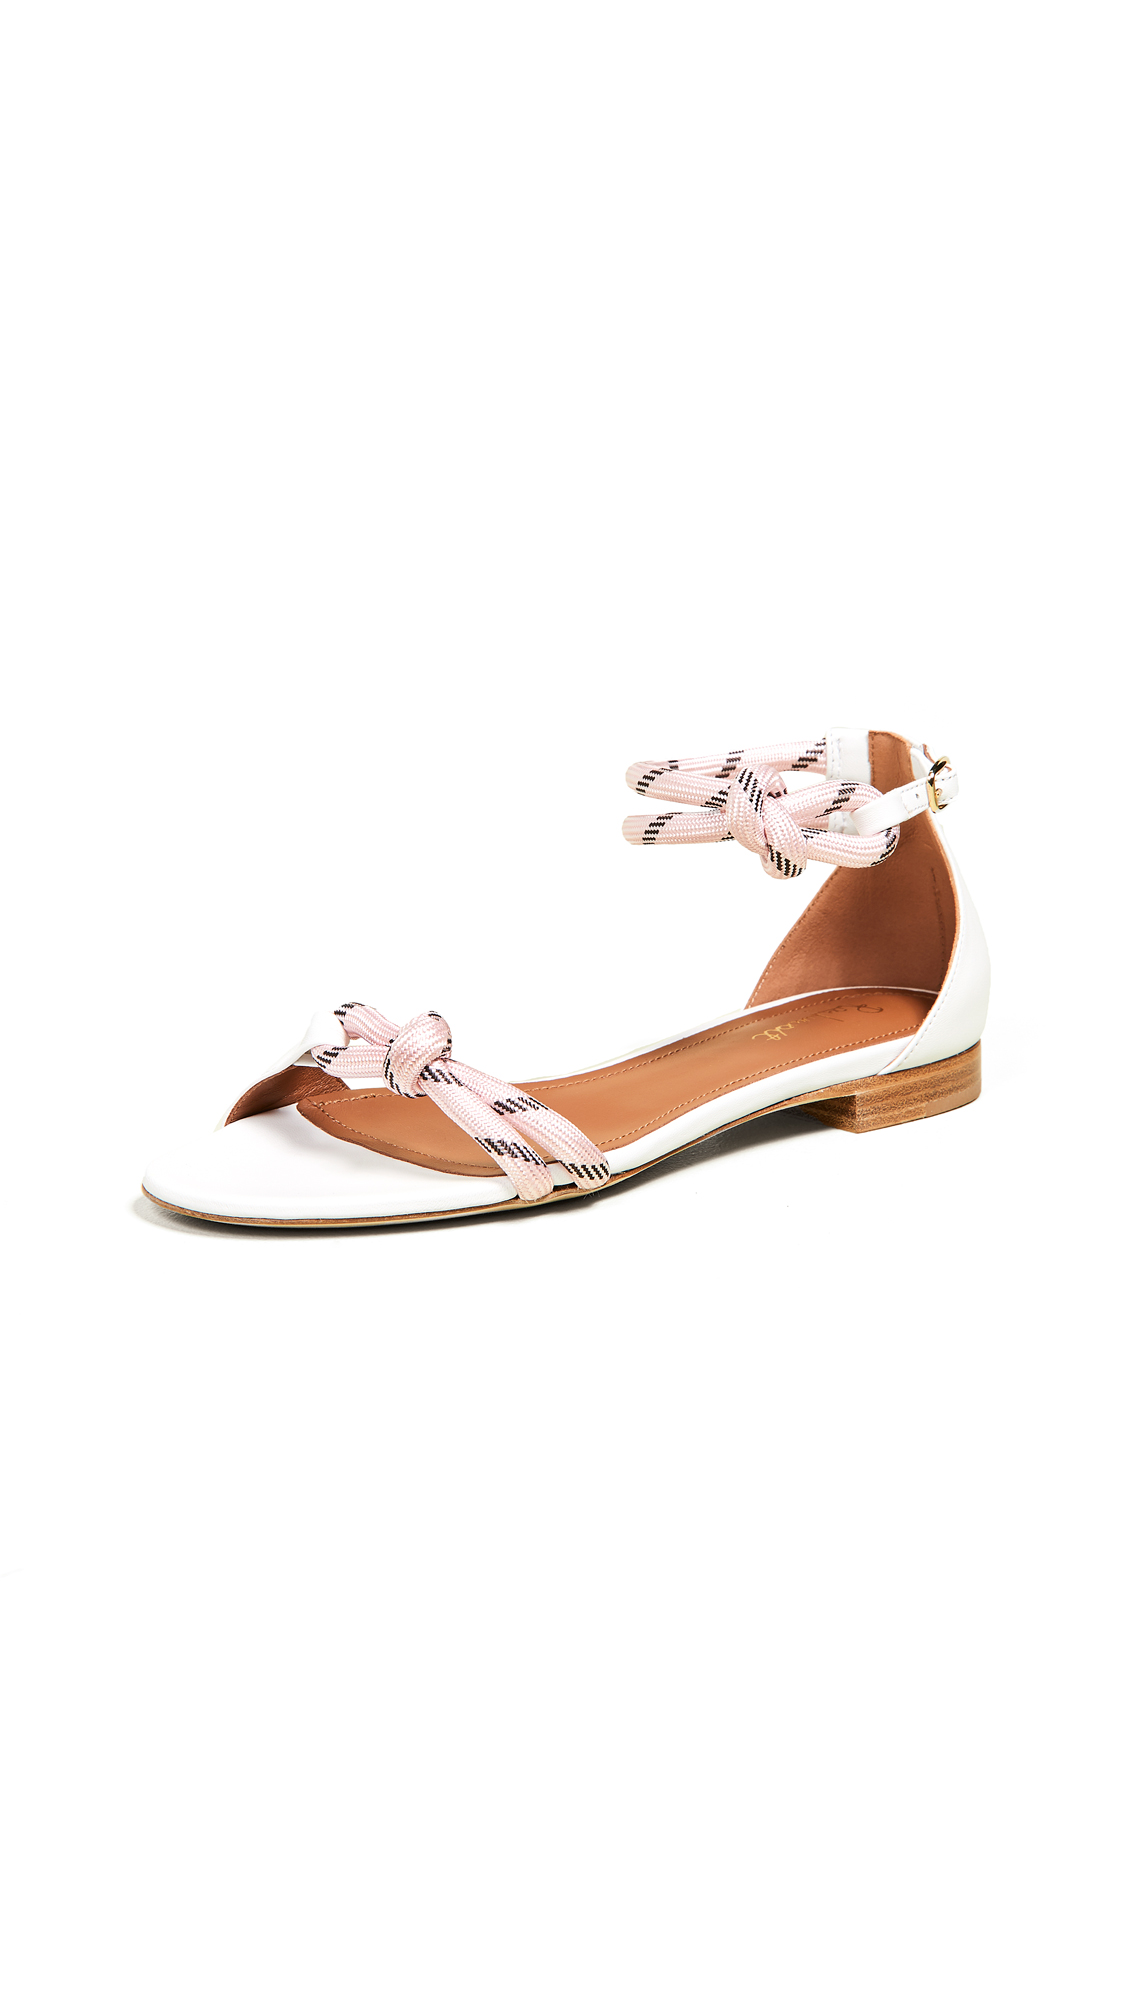 Malone Souliers Fenn Flat Sandals - White/Pink